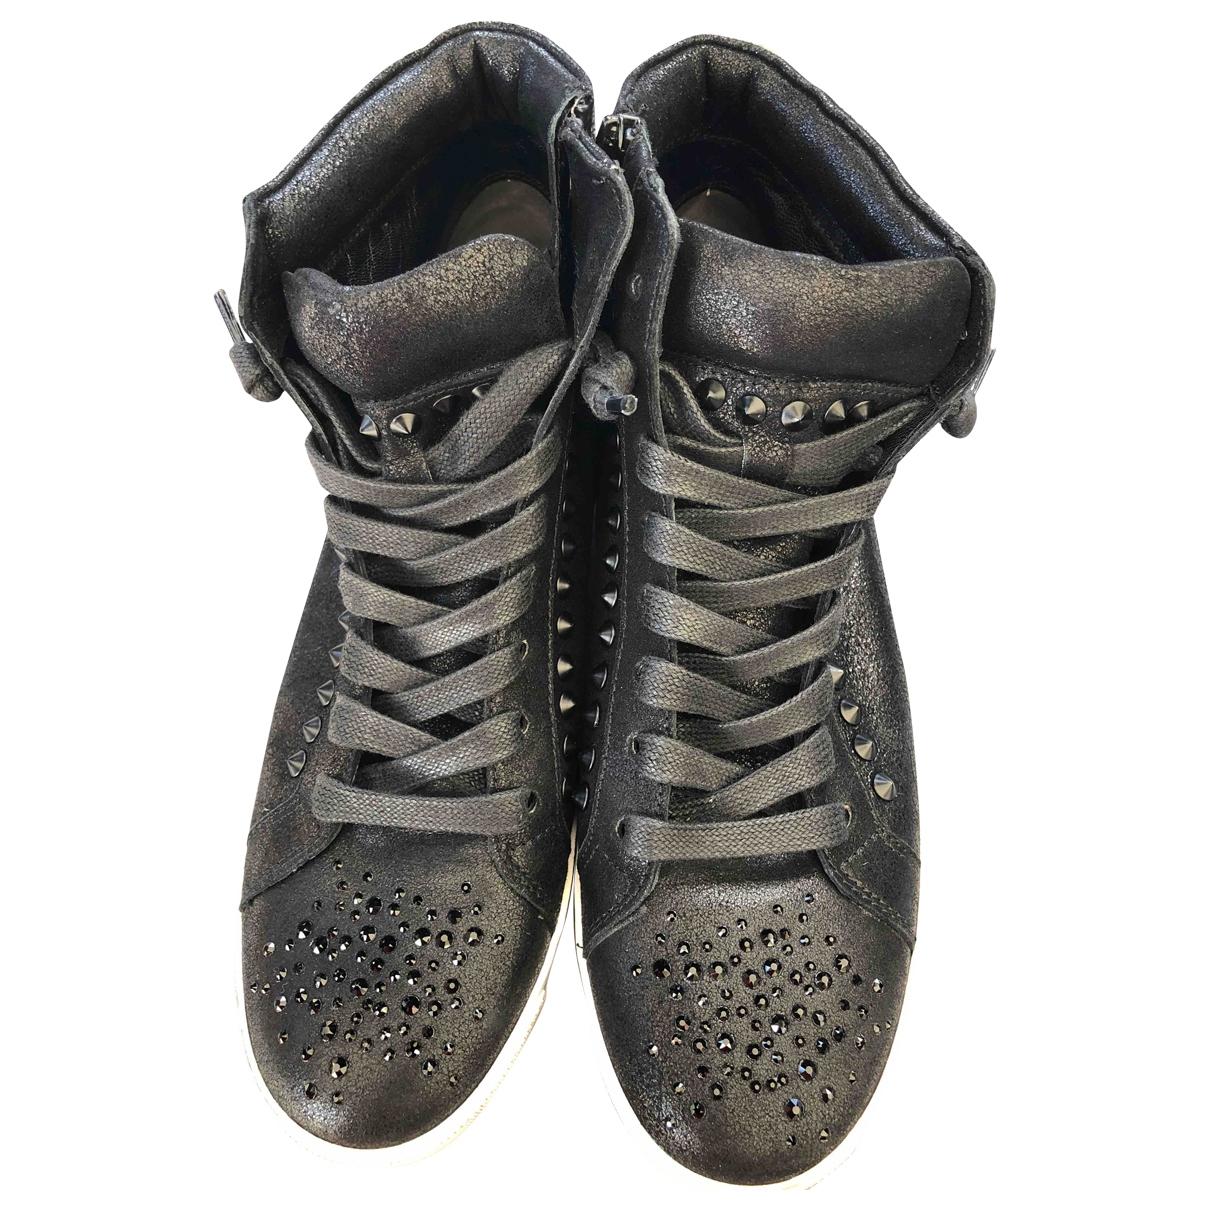 Kennel Und Schmenger \N Black Leather Trainers for Women 39 EU